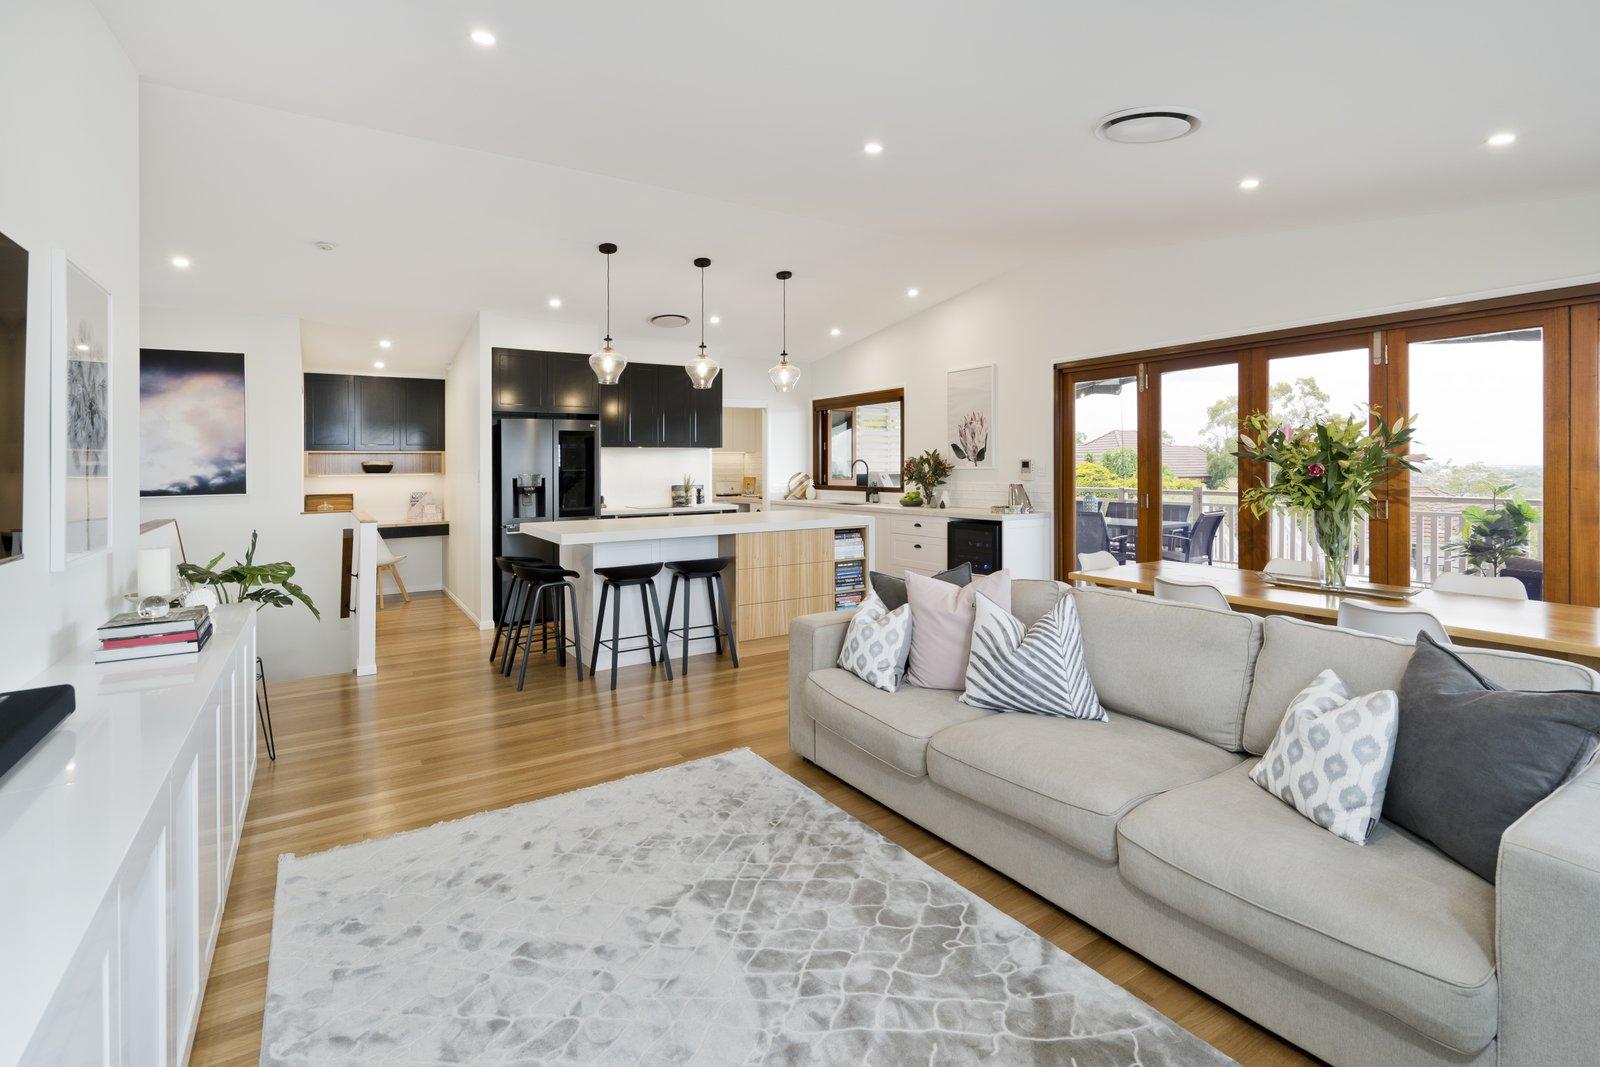 Alderley Queenslander Modern Home In Alderley, Queensland, Australia On Dwell